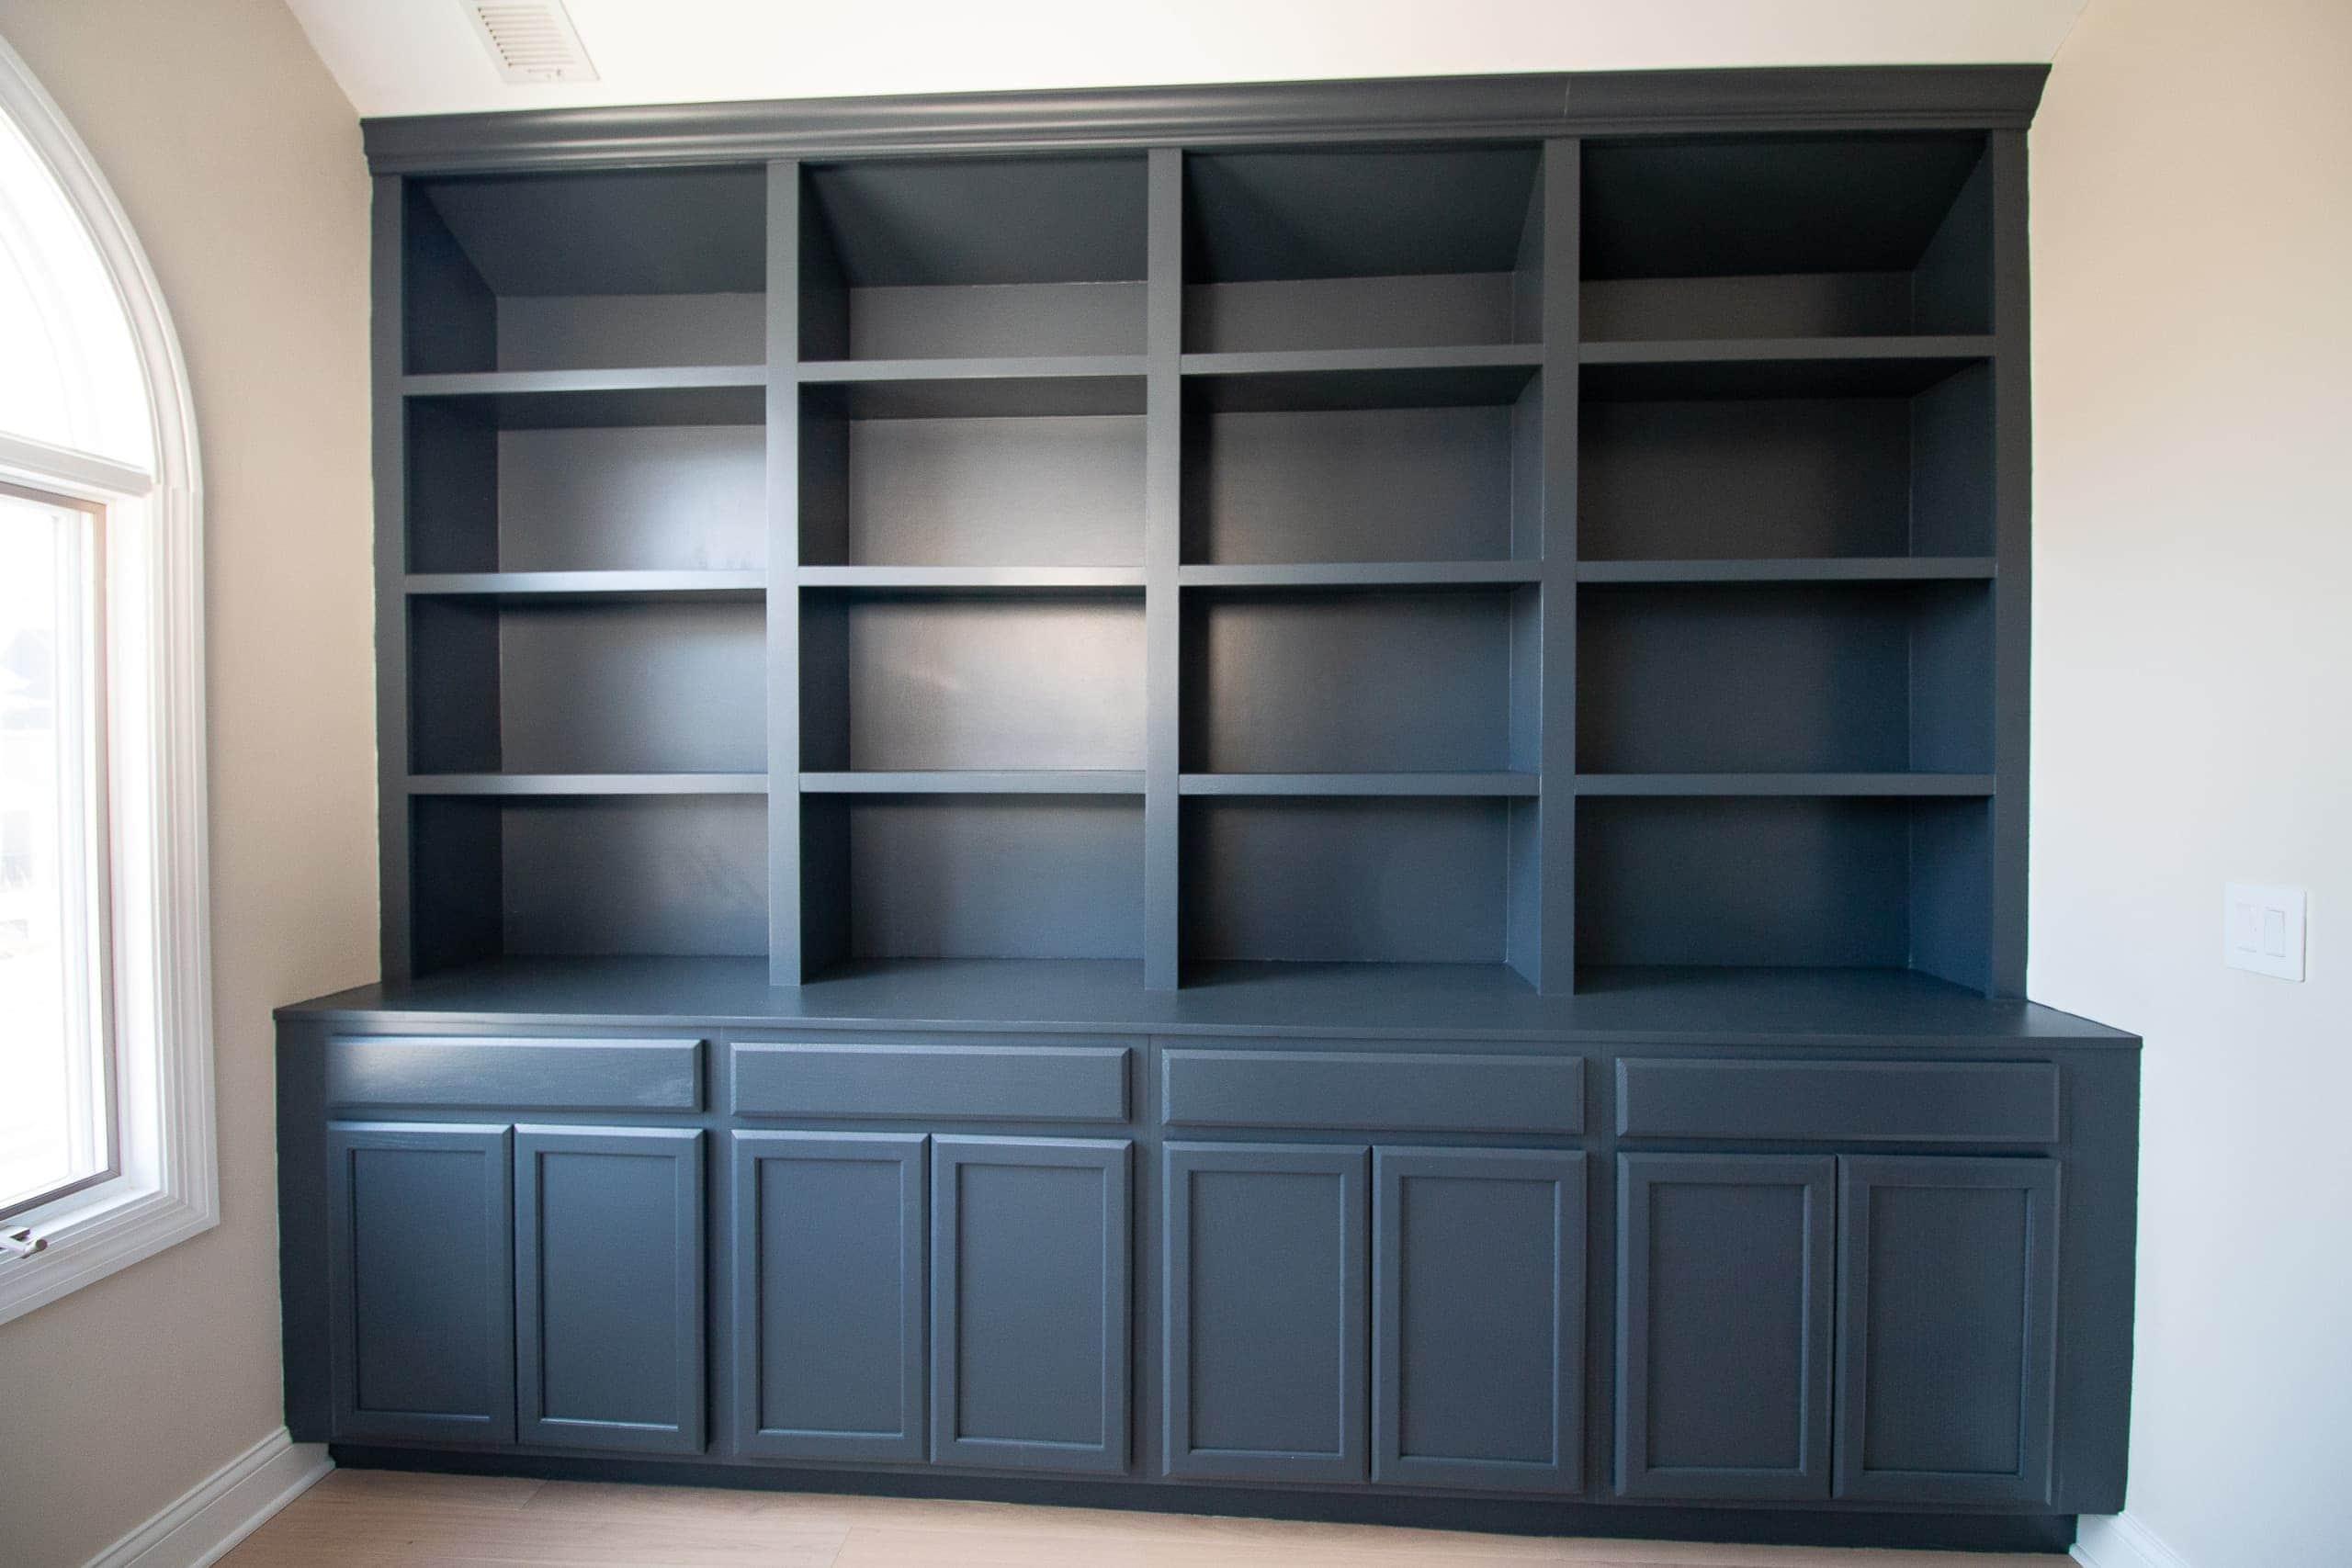 Dark blue painted built-ins